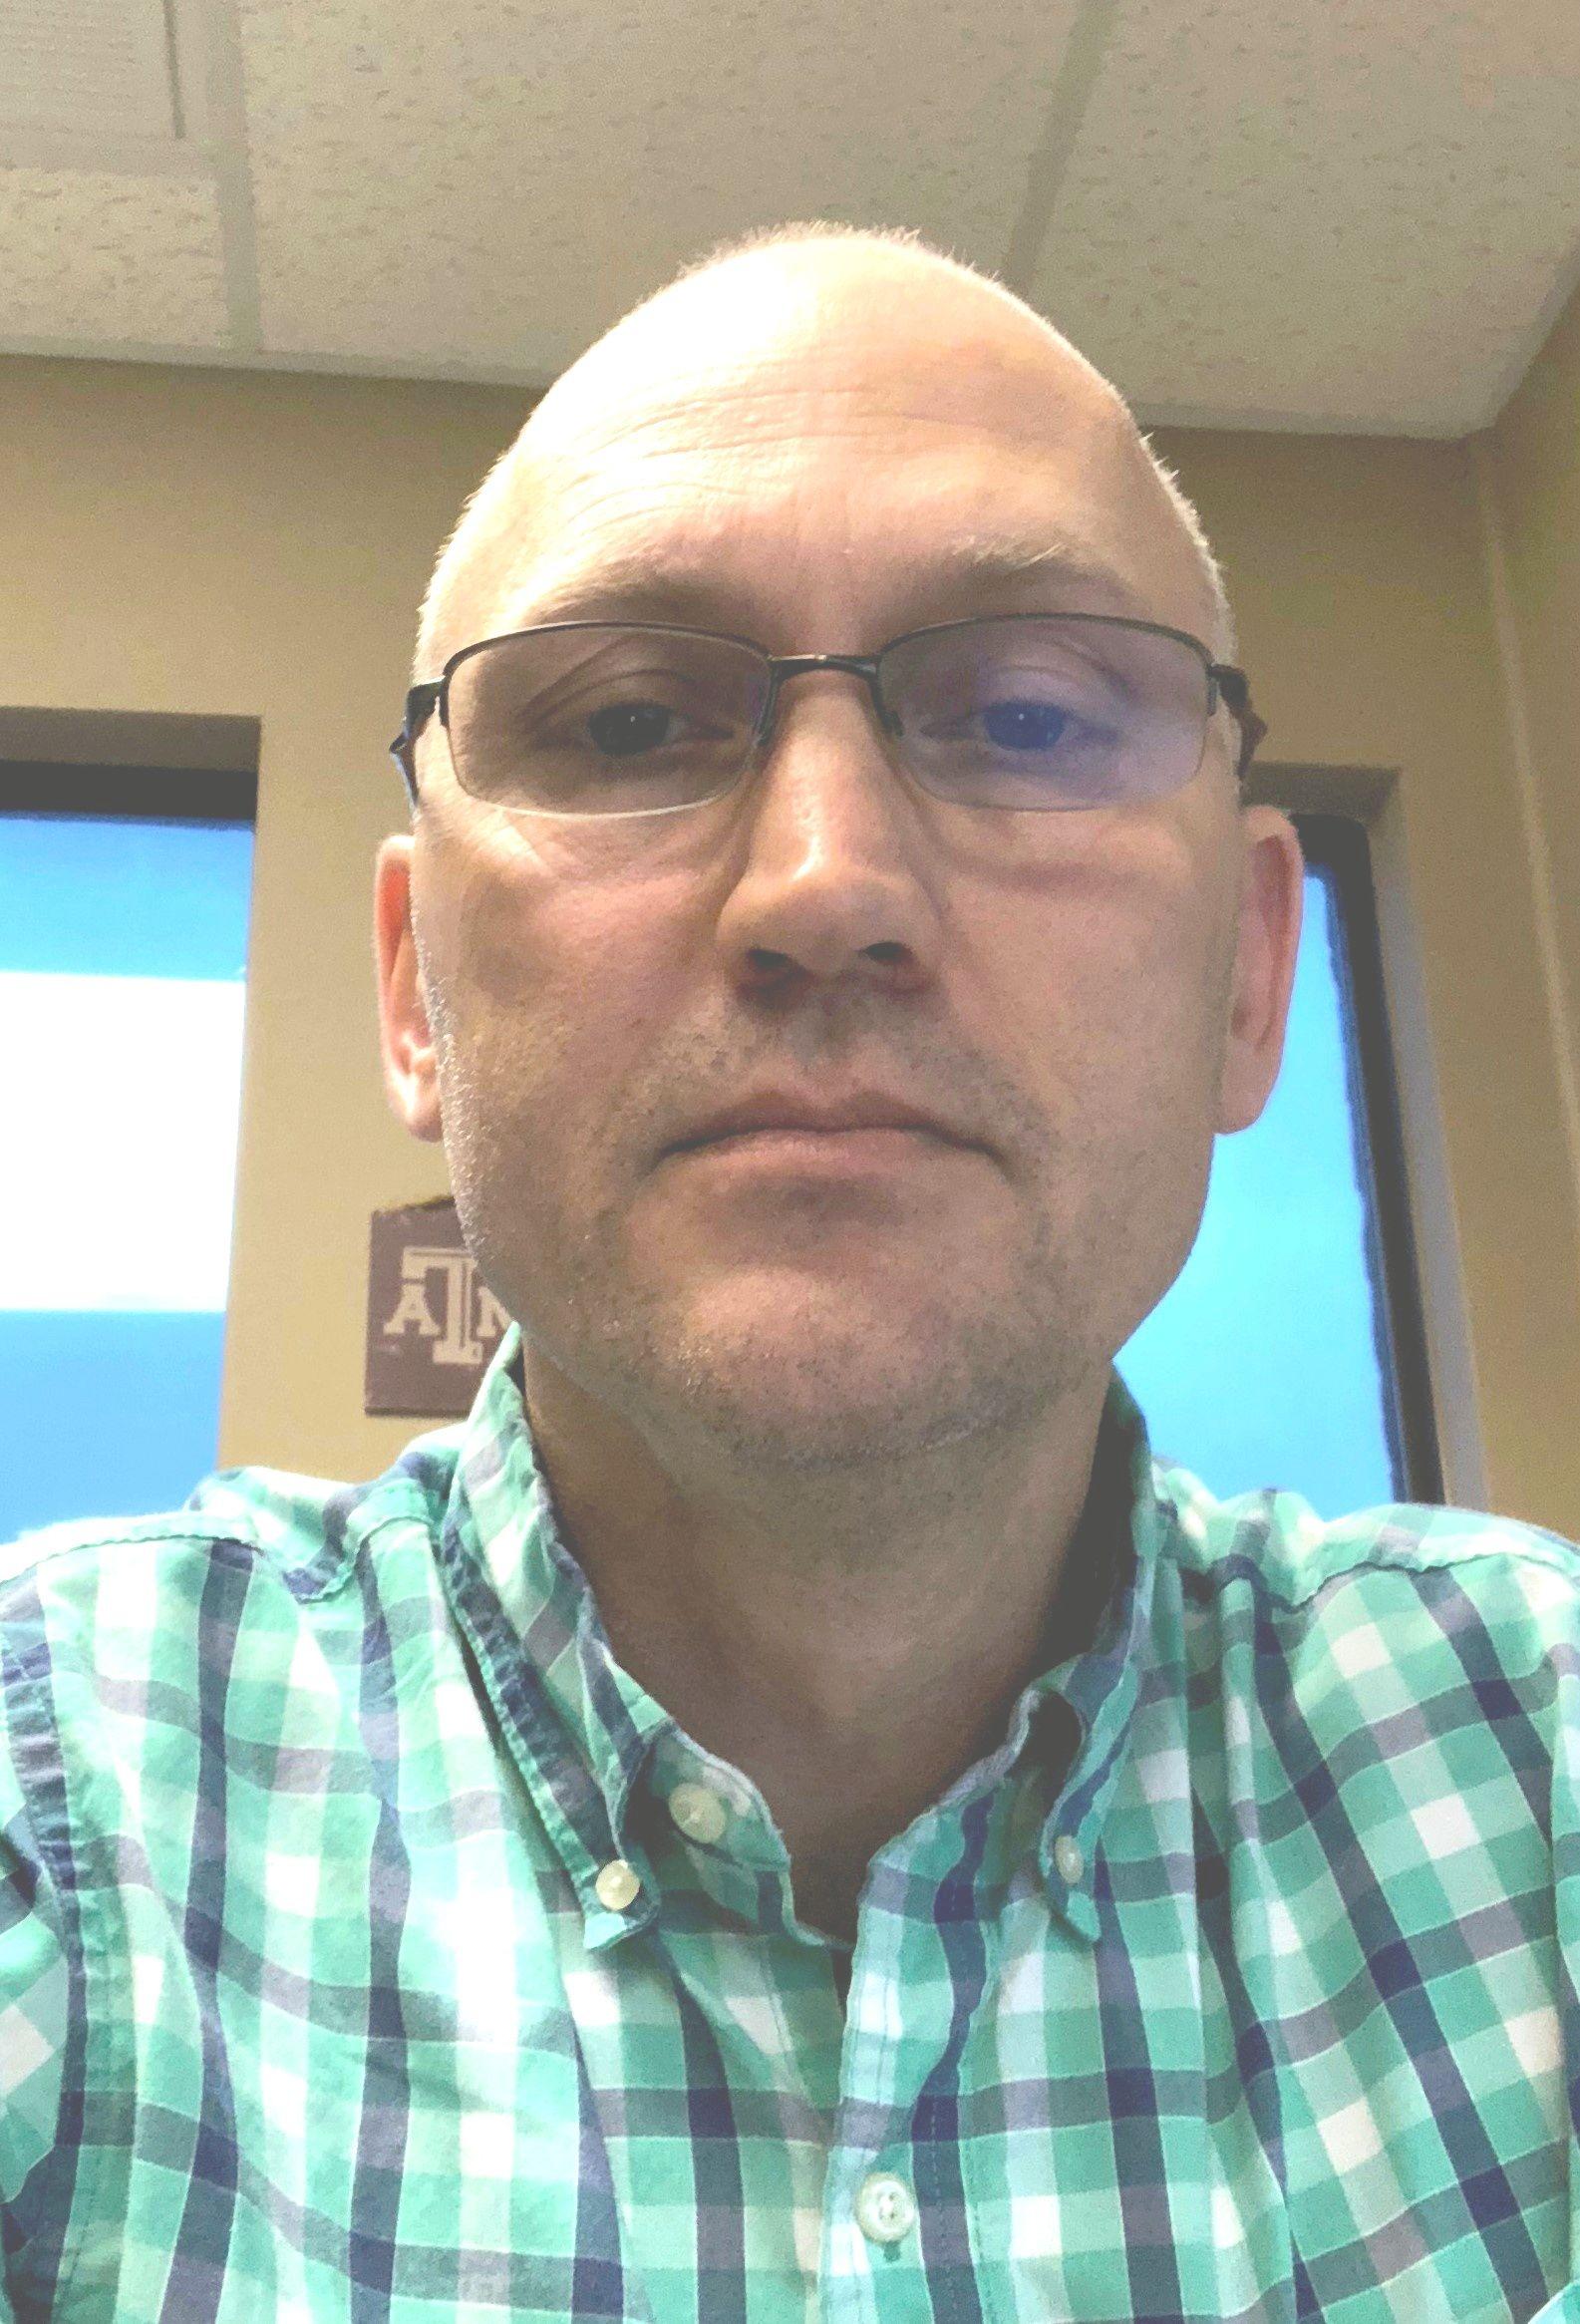 Joe Franklin, director of analytical testingat Intertek